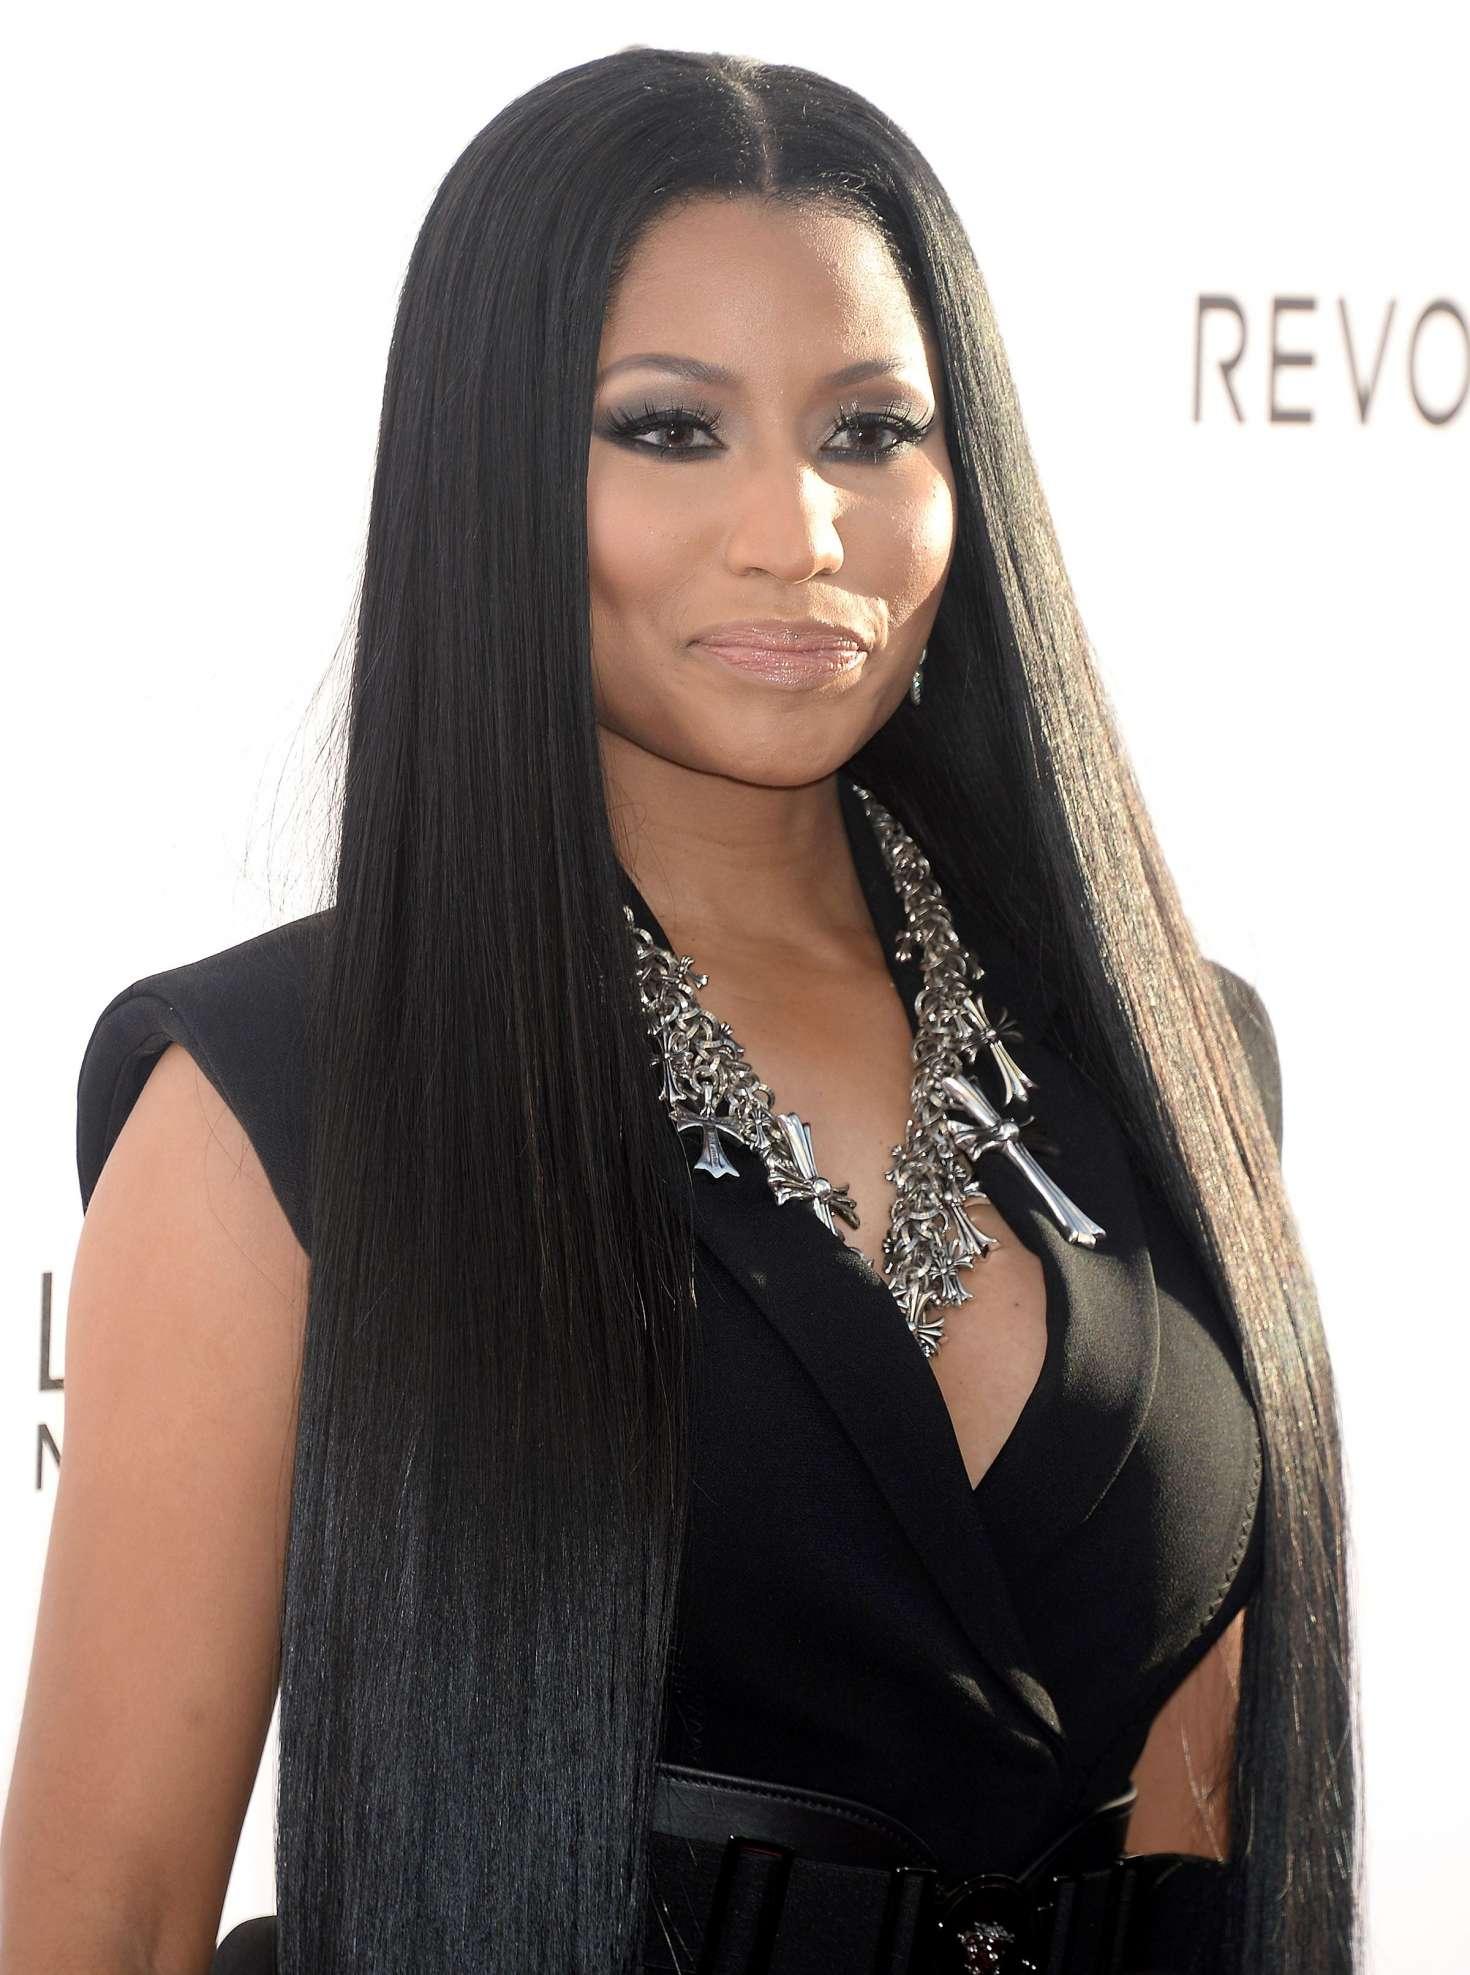 Nicki Minaj - Daily Front Row's 3rd Annual Fashion LA Awards in West Hollywood